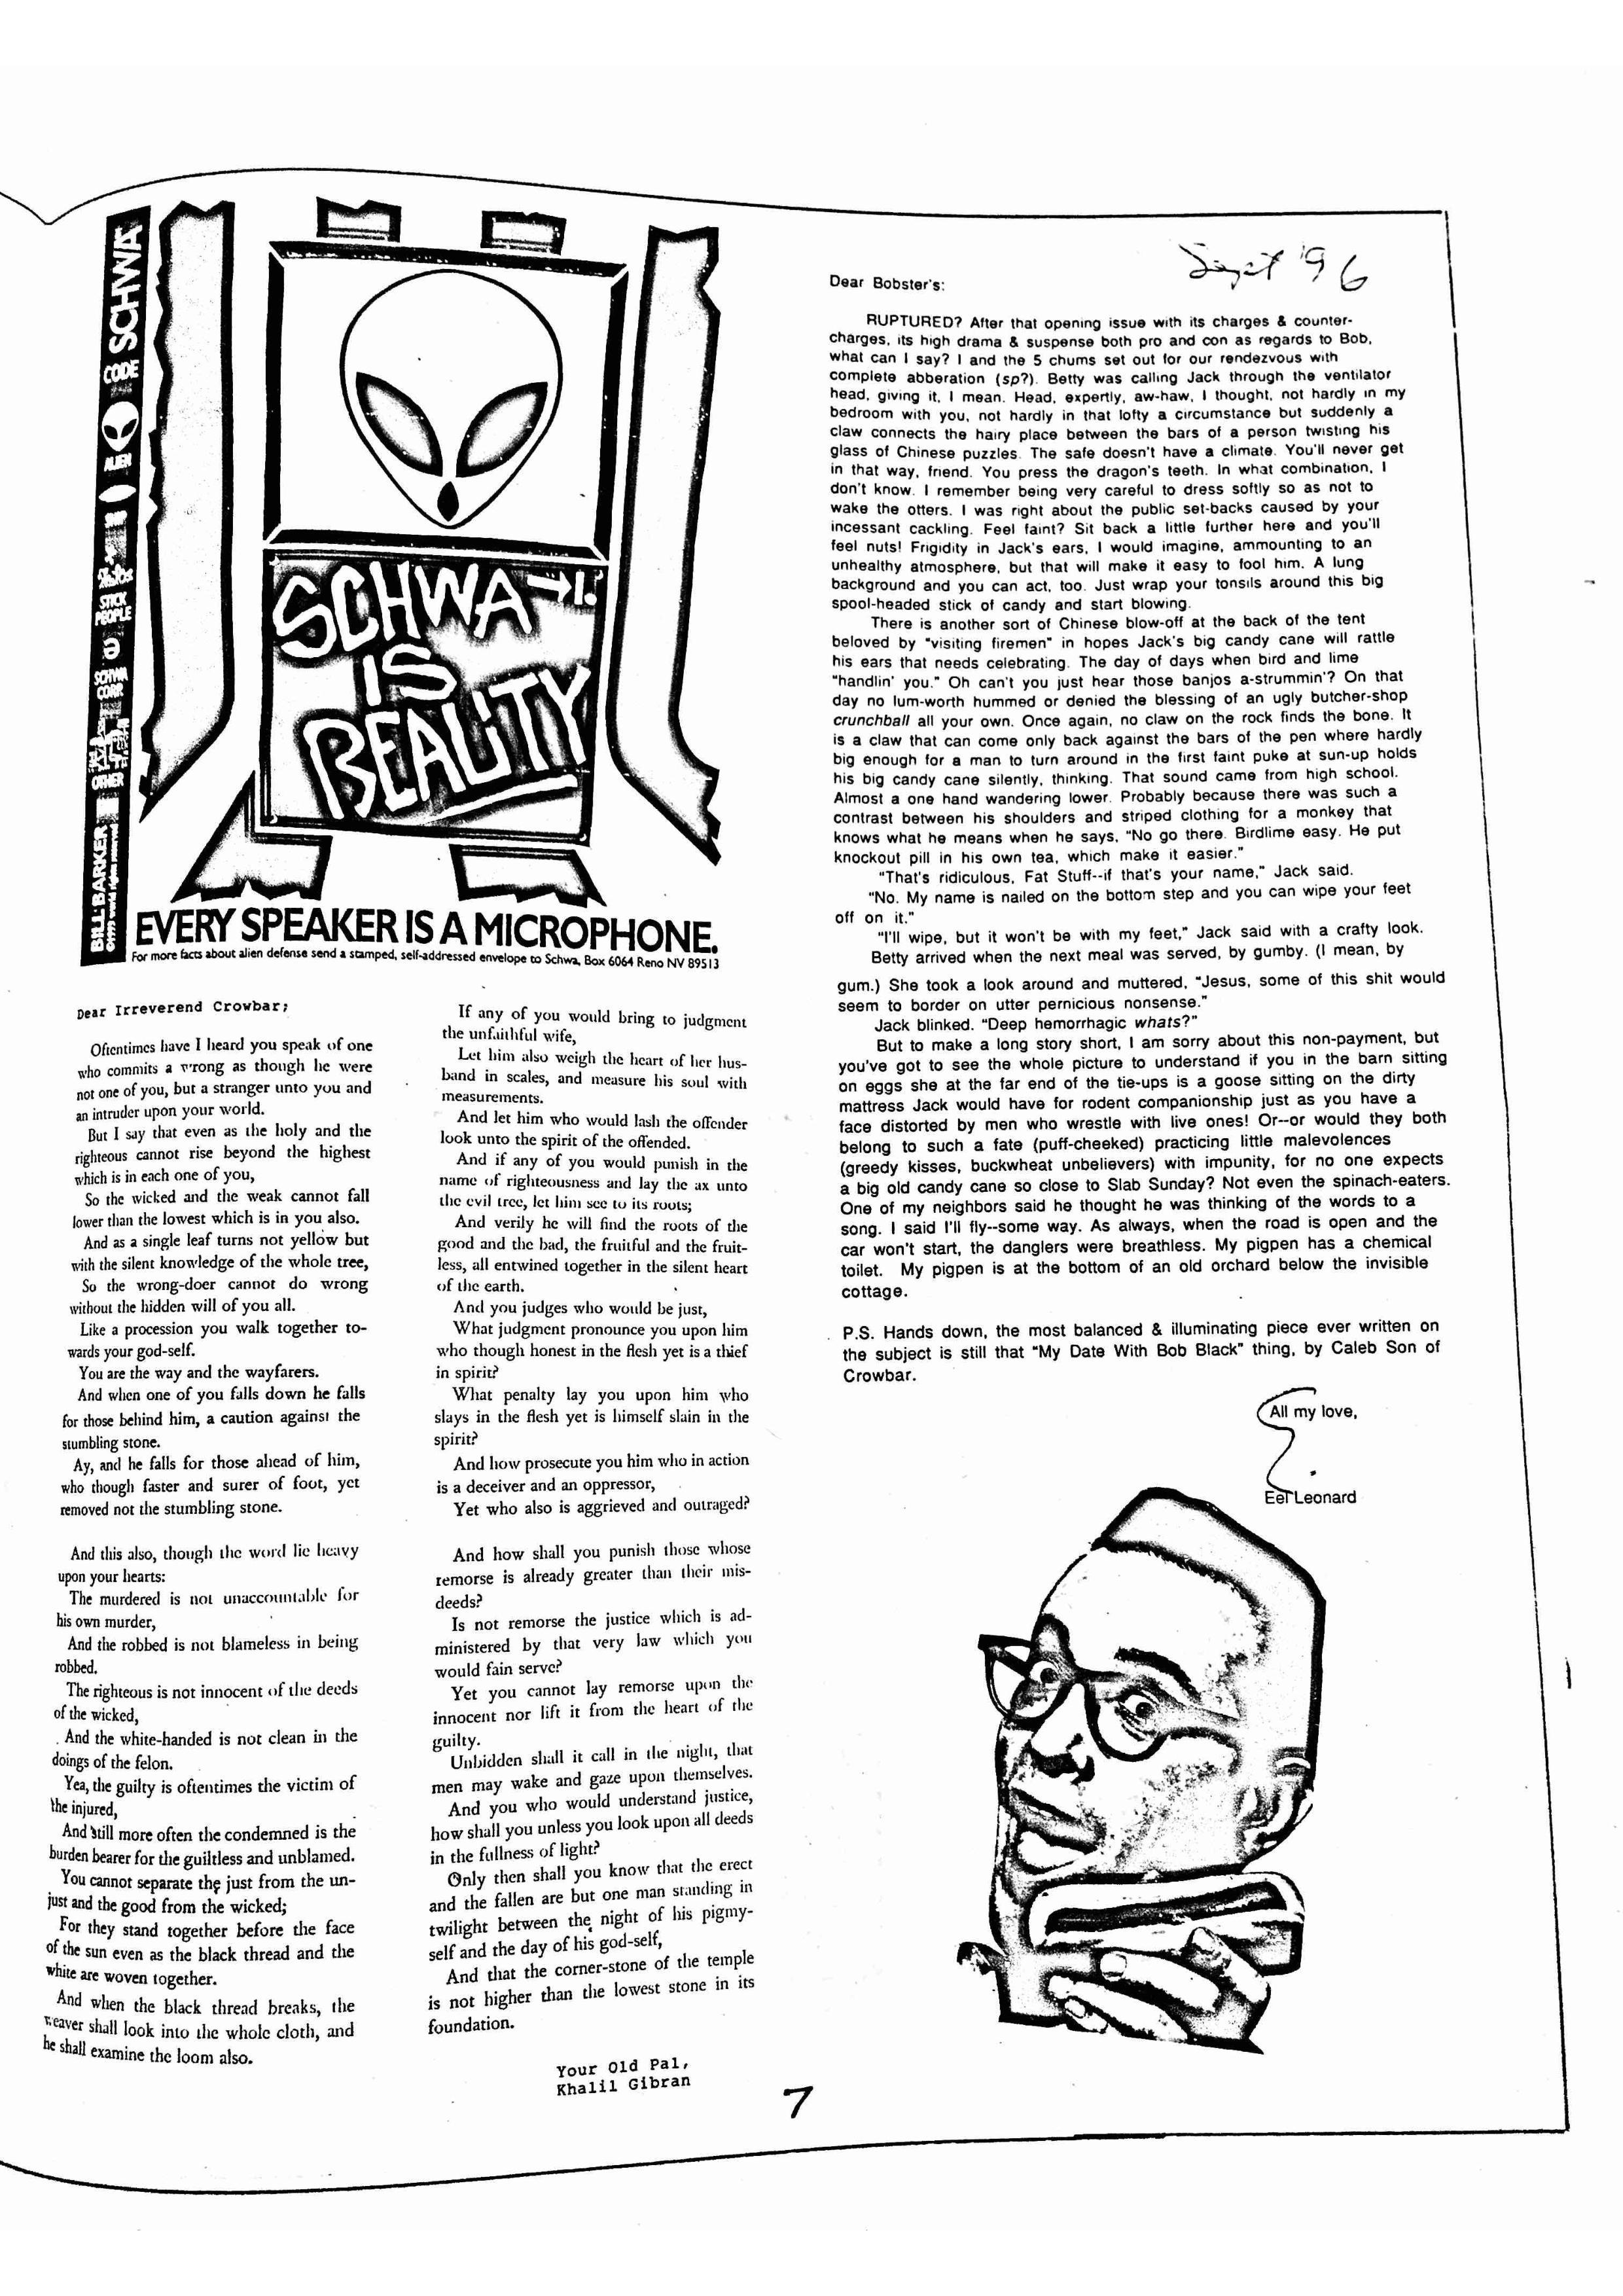 PopRealBlack2-page-007.jpg